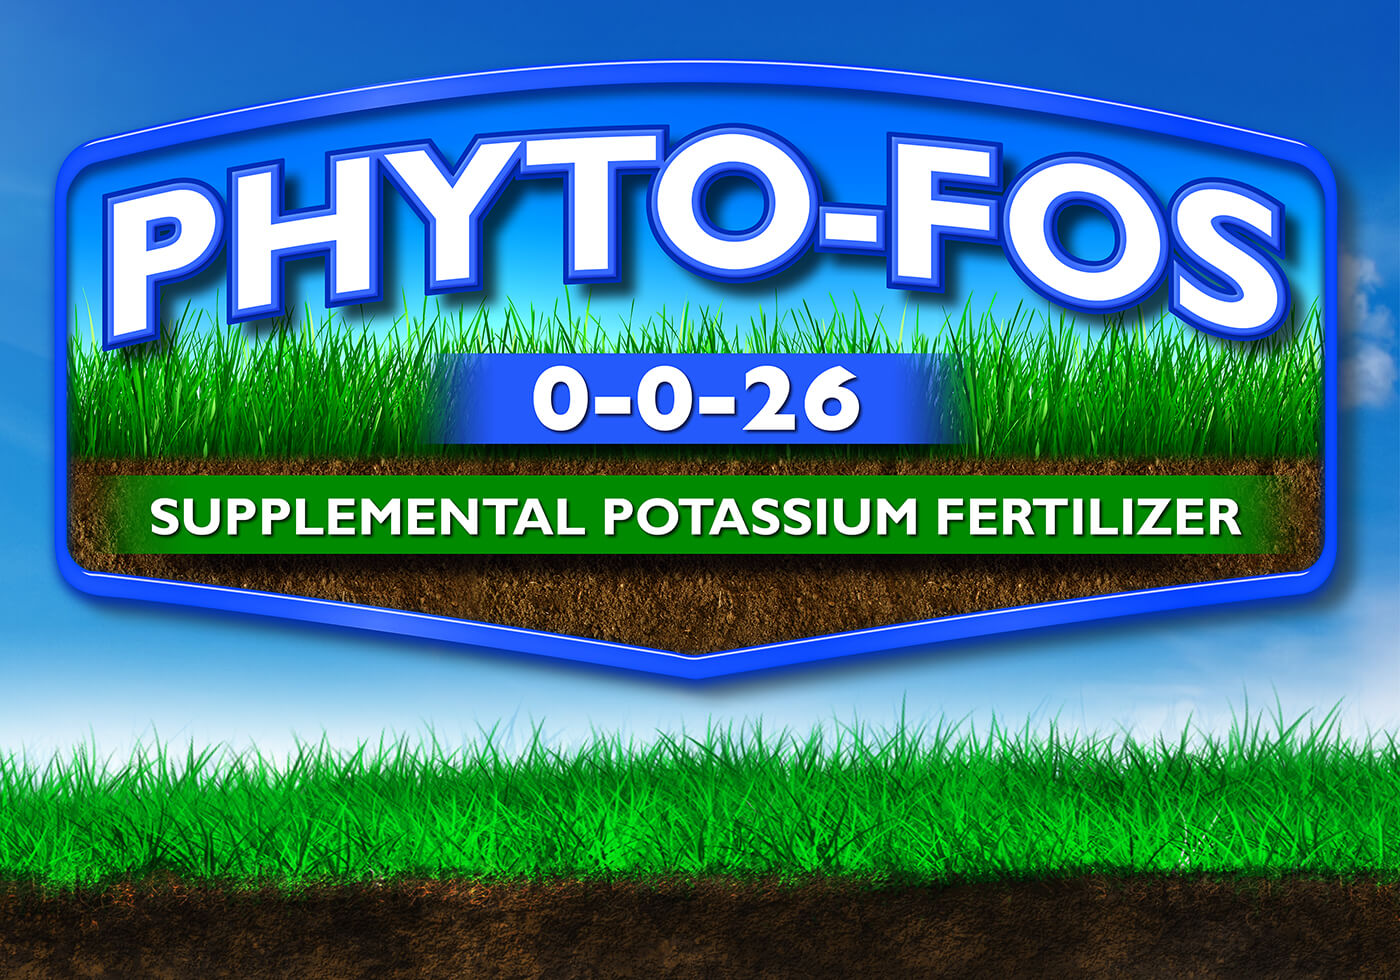 large blue phyto fos 0-0-26 logo supplemental potassium fertilizer over blue sky background grass and dirt